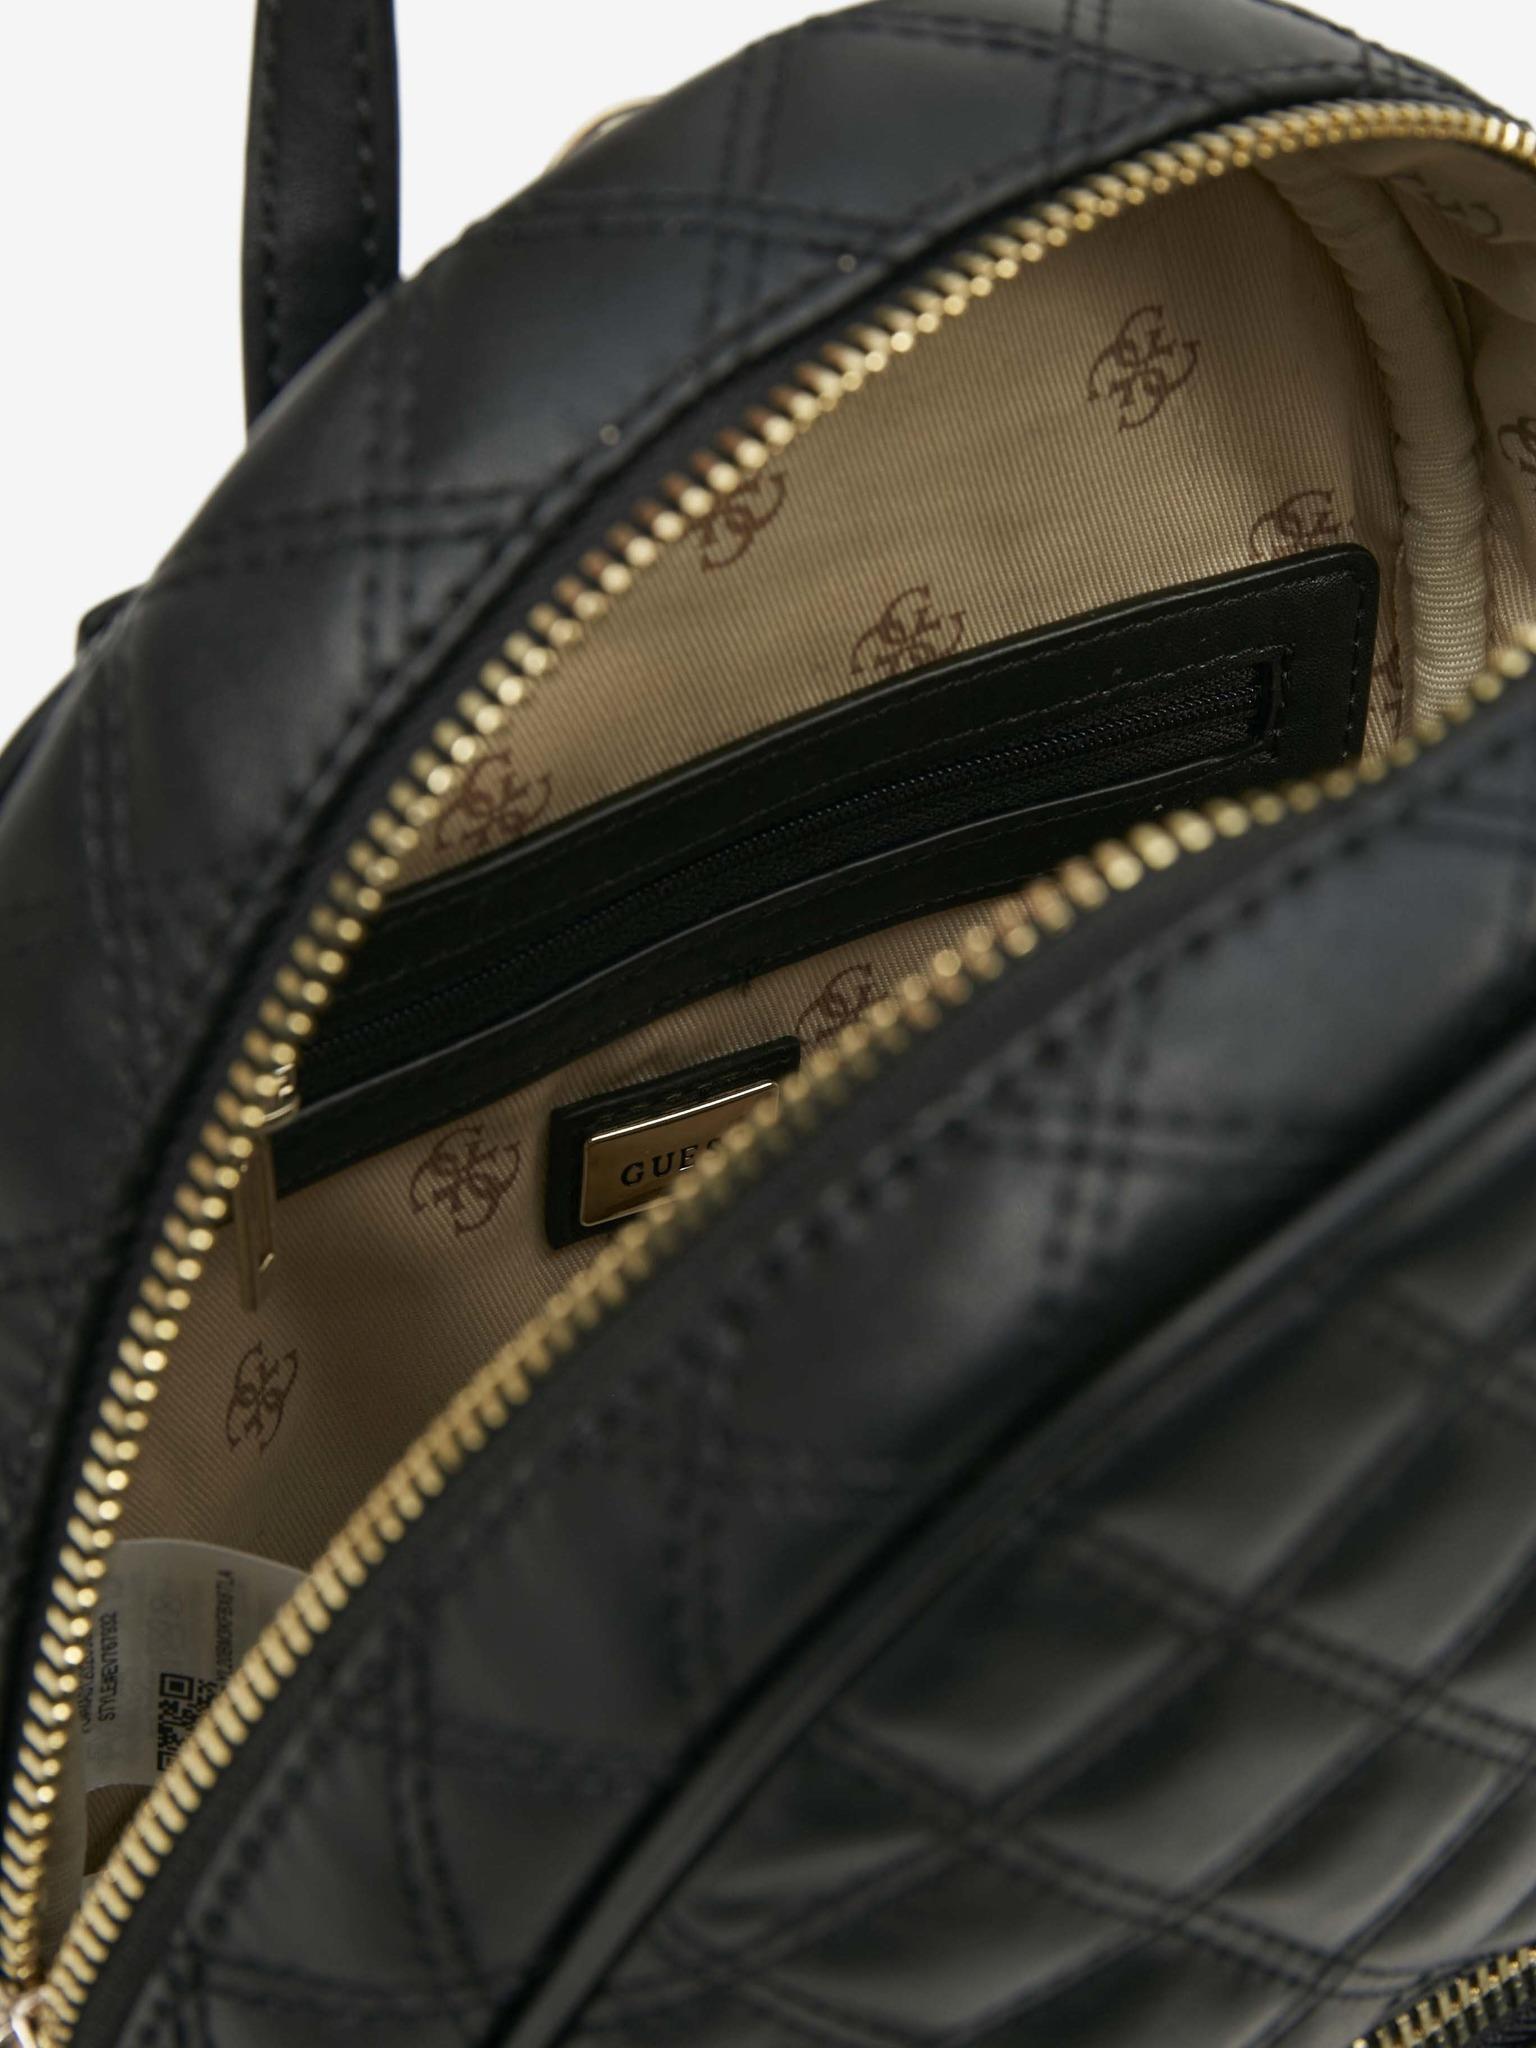 Guess Women's backpack black Batoh